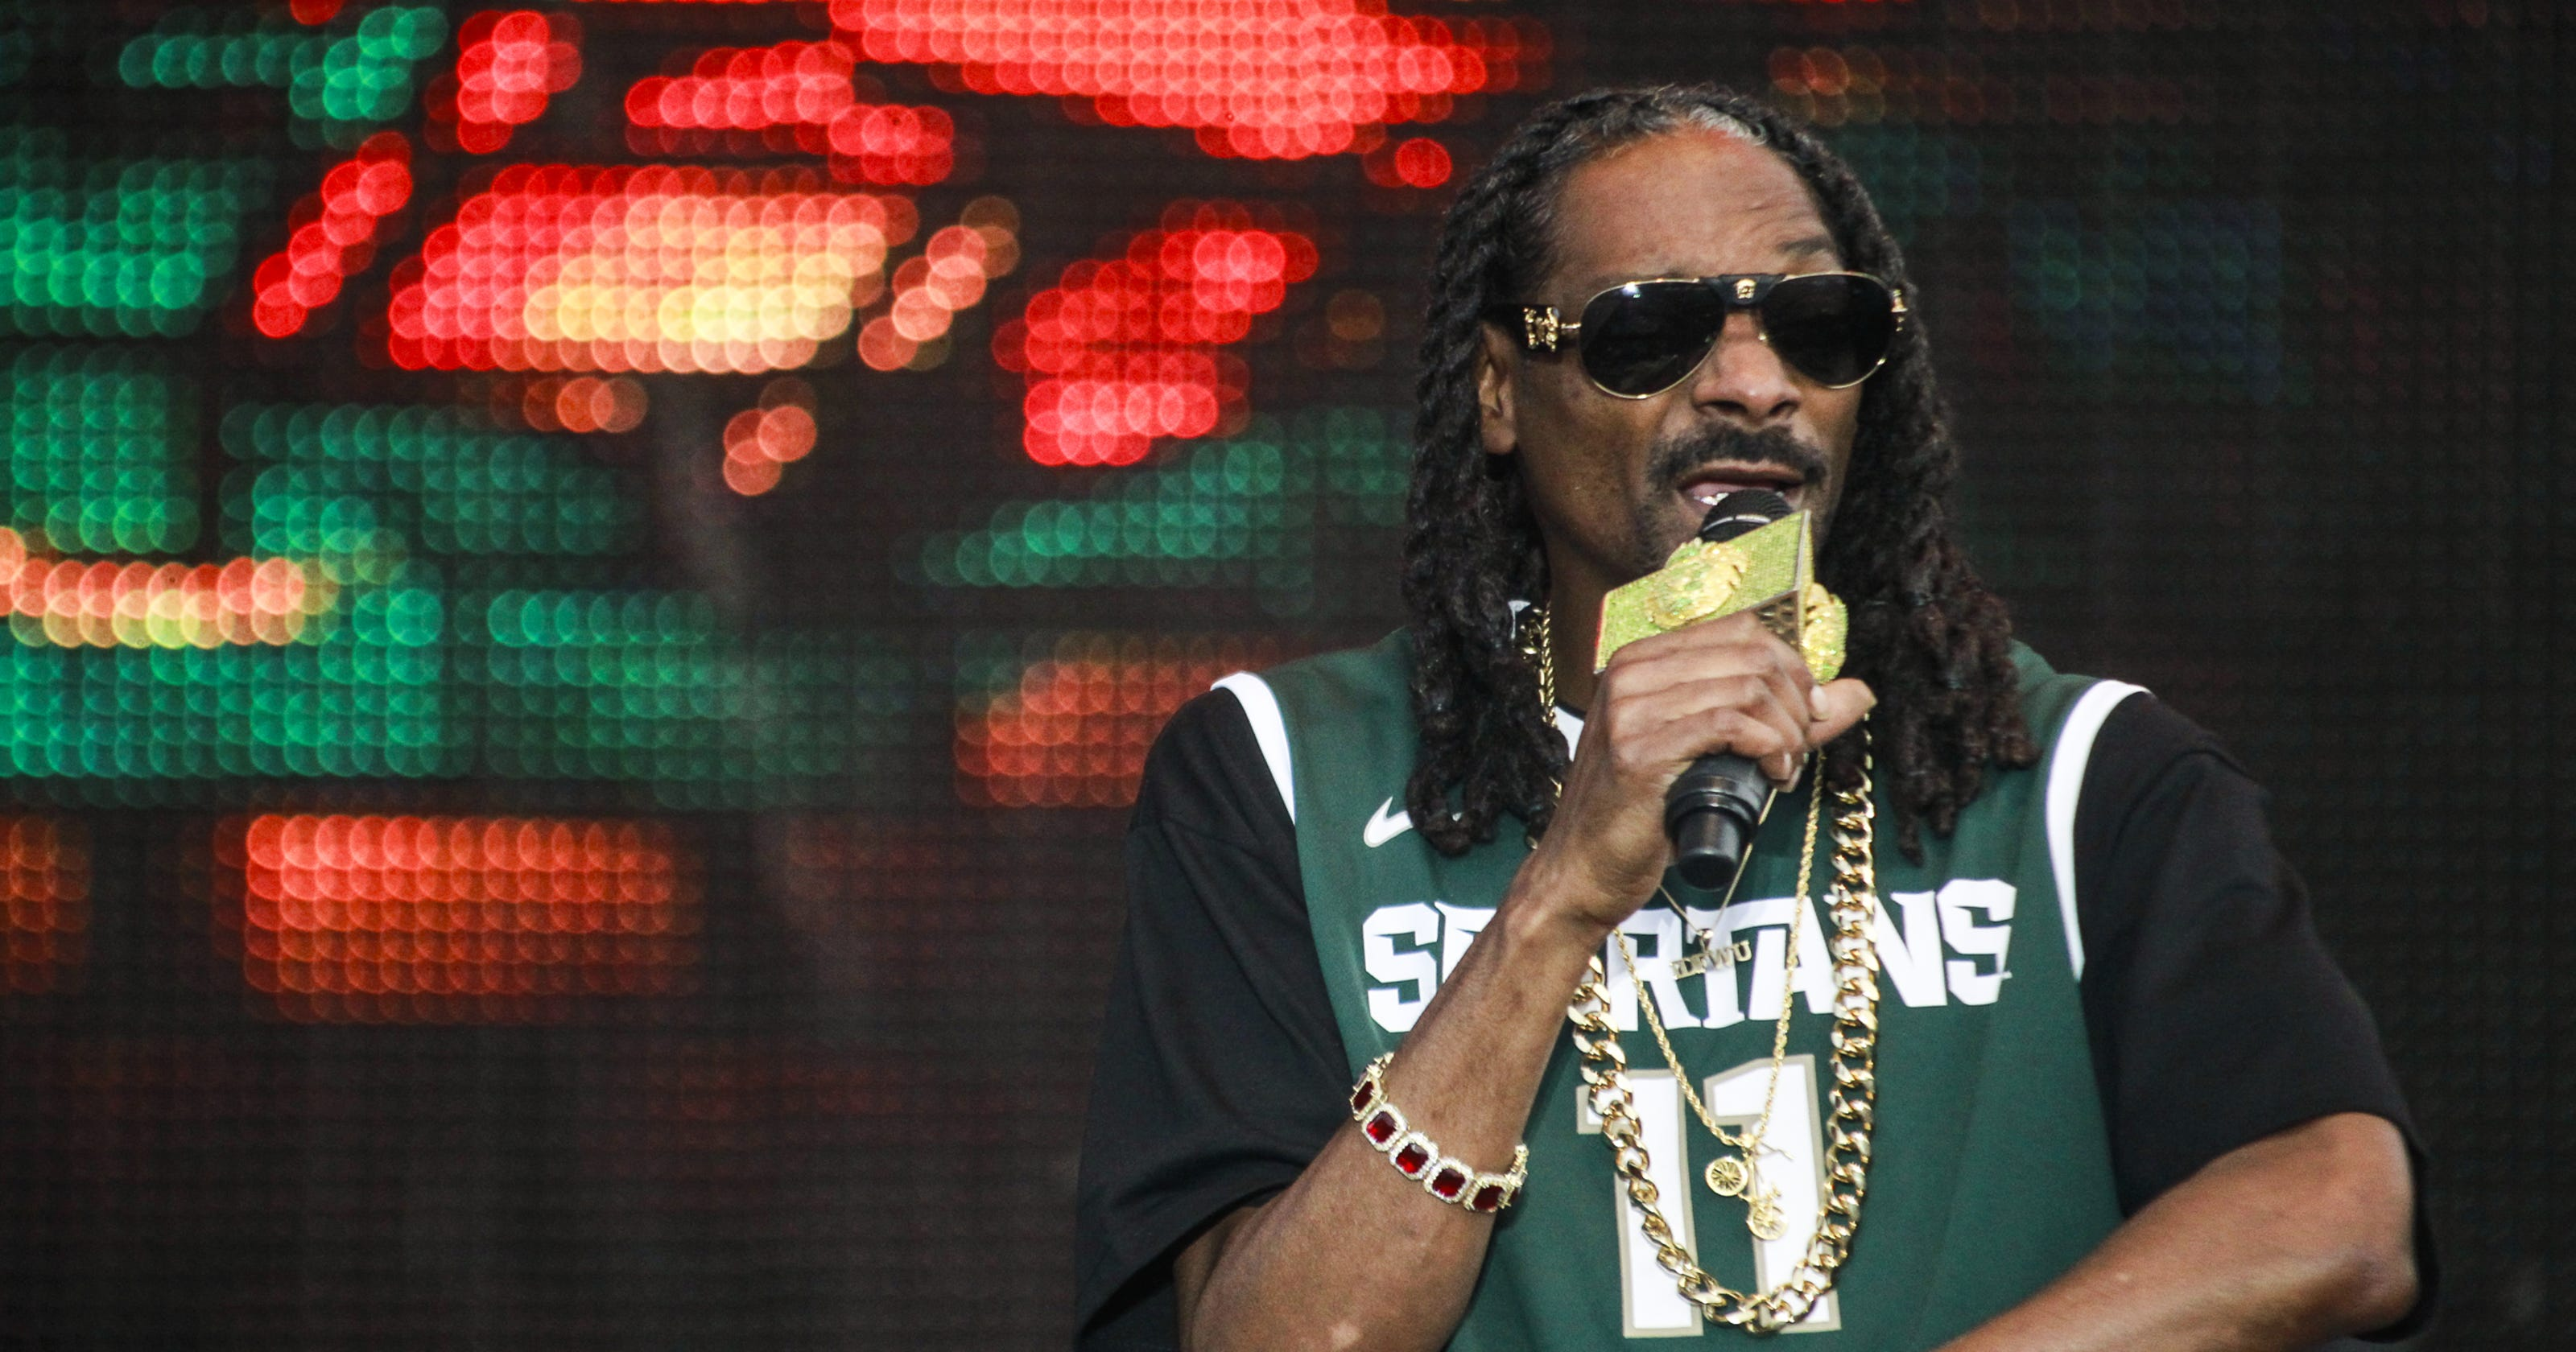 Morris Peterson Snoop Dogg Hoops Game To Benefit Flint